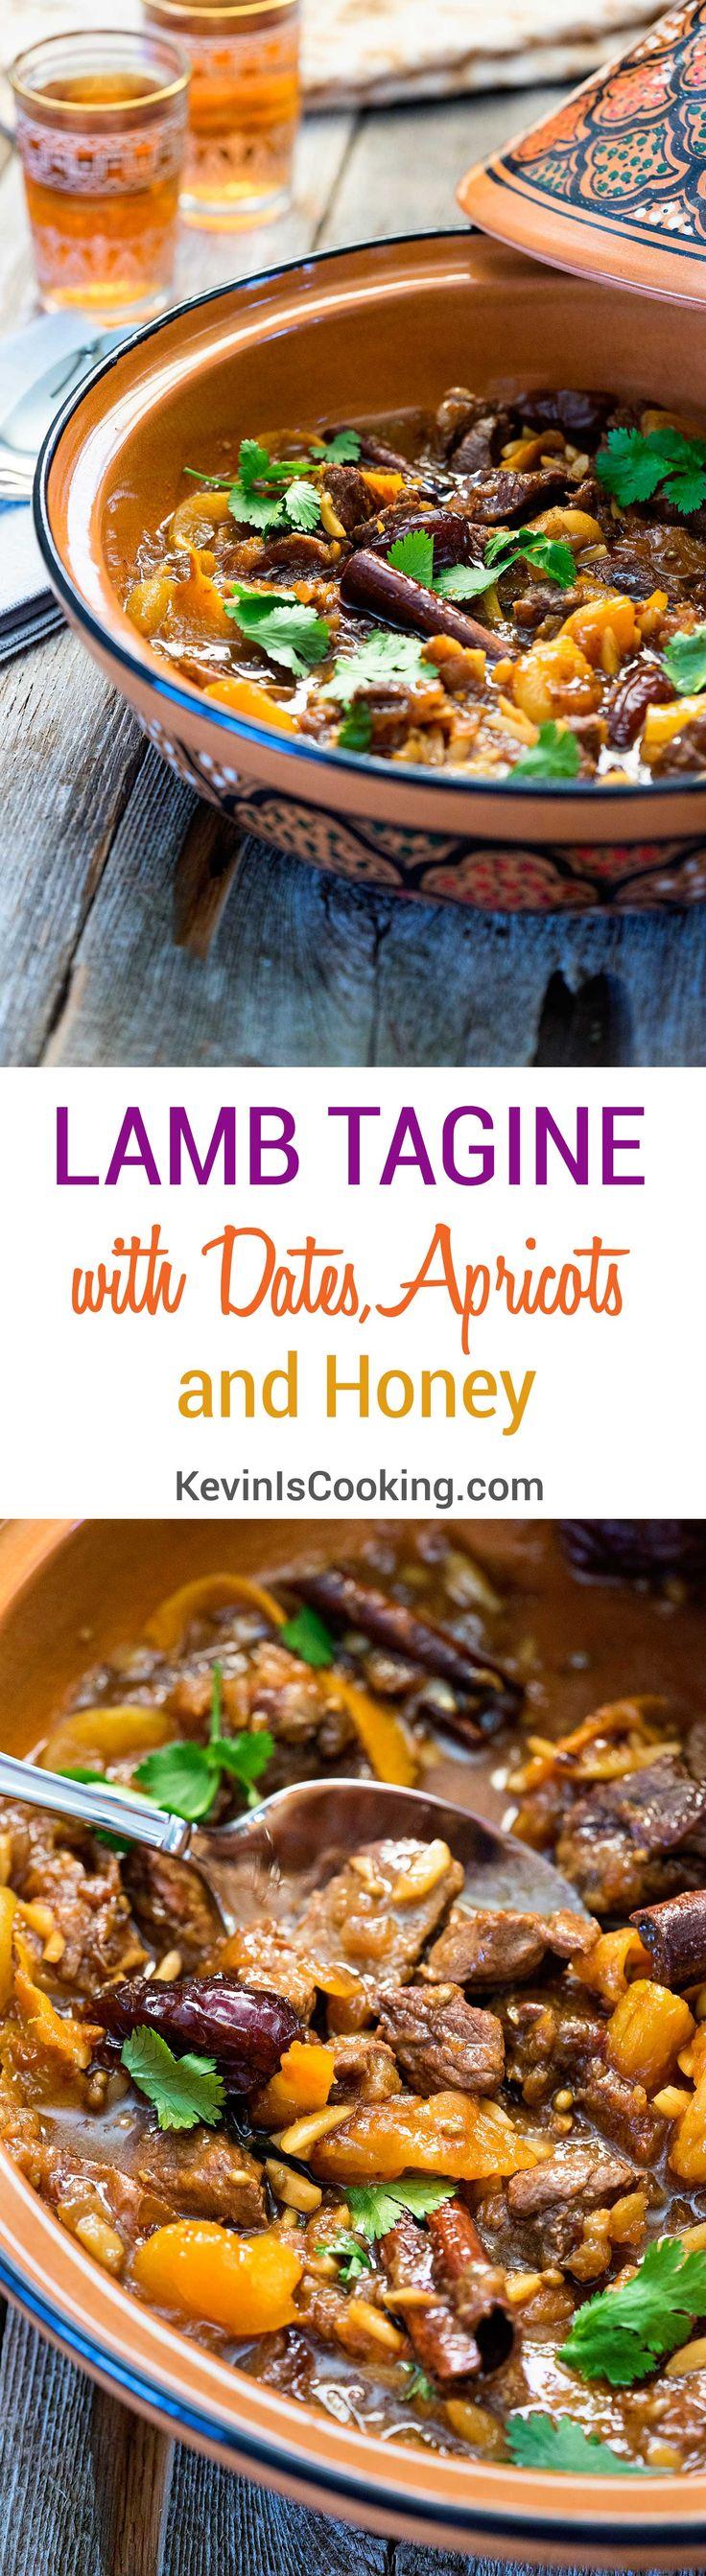 19 best Tagine recipes images on Pinterest